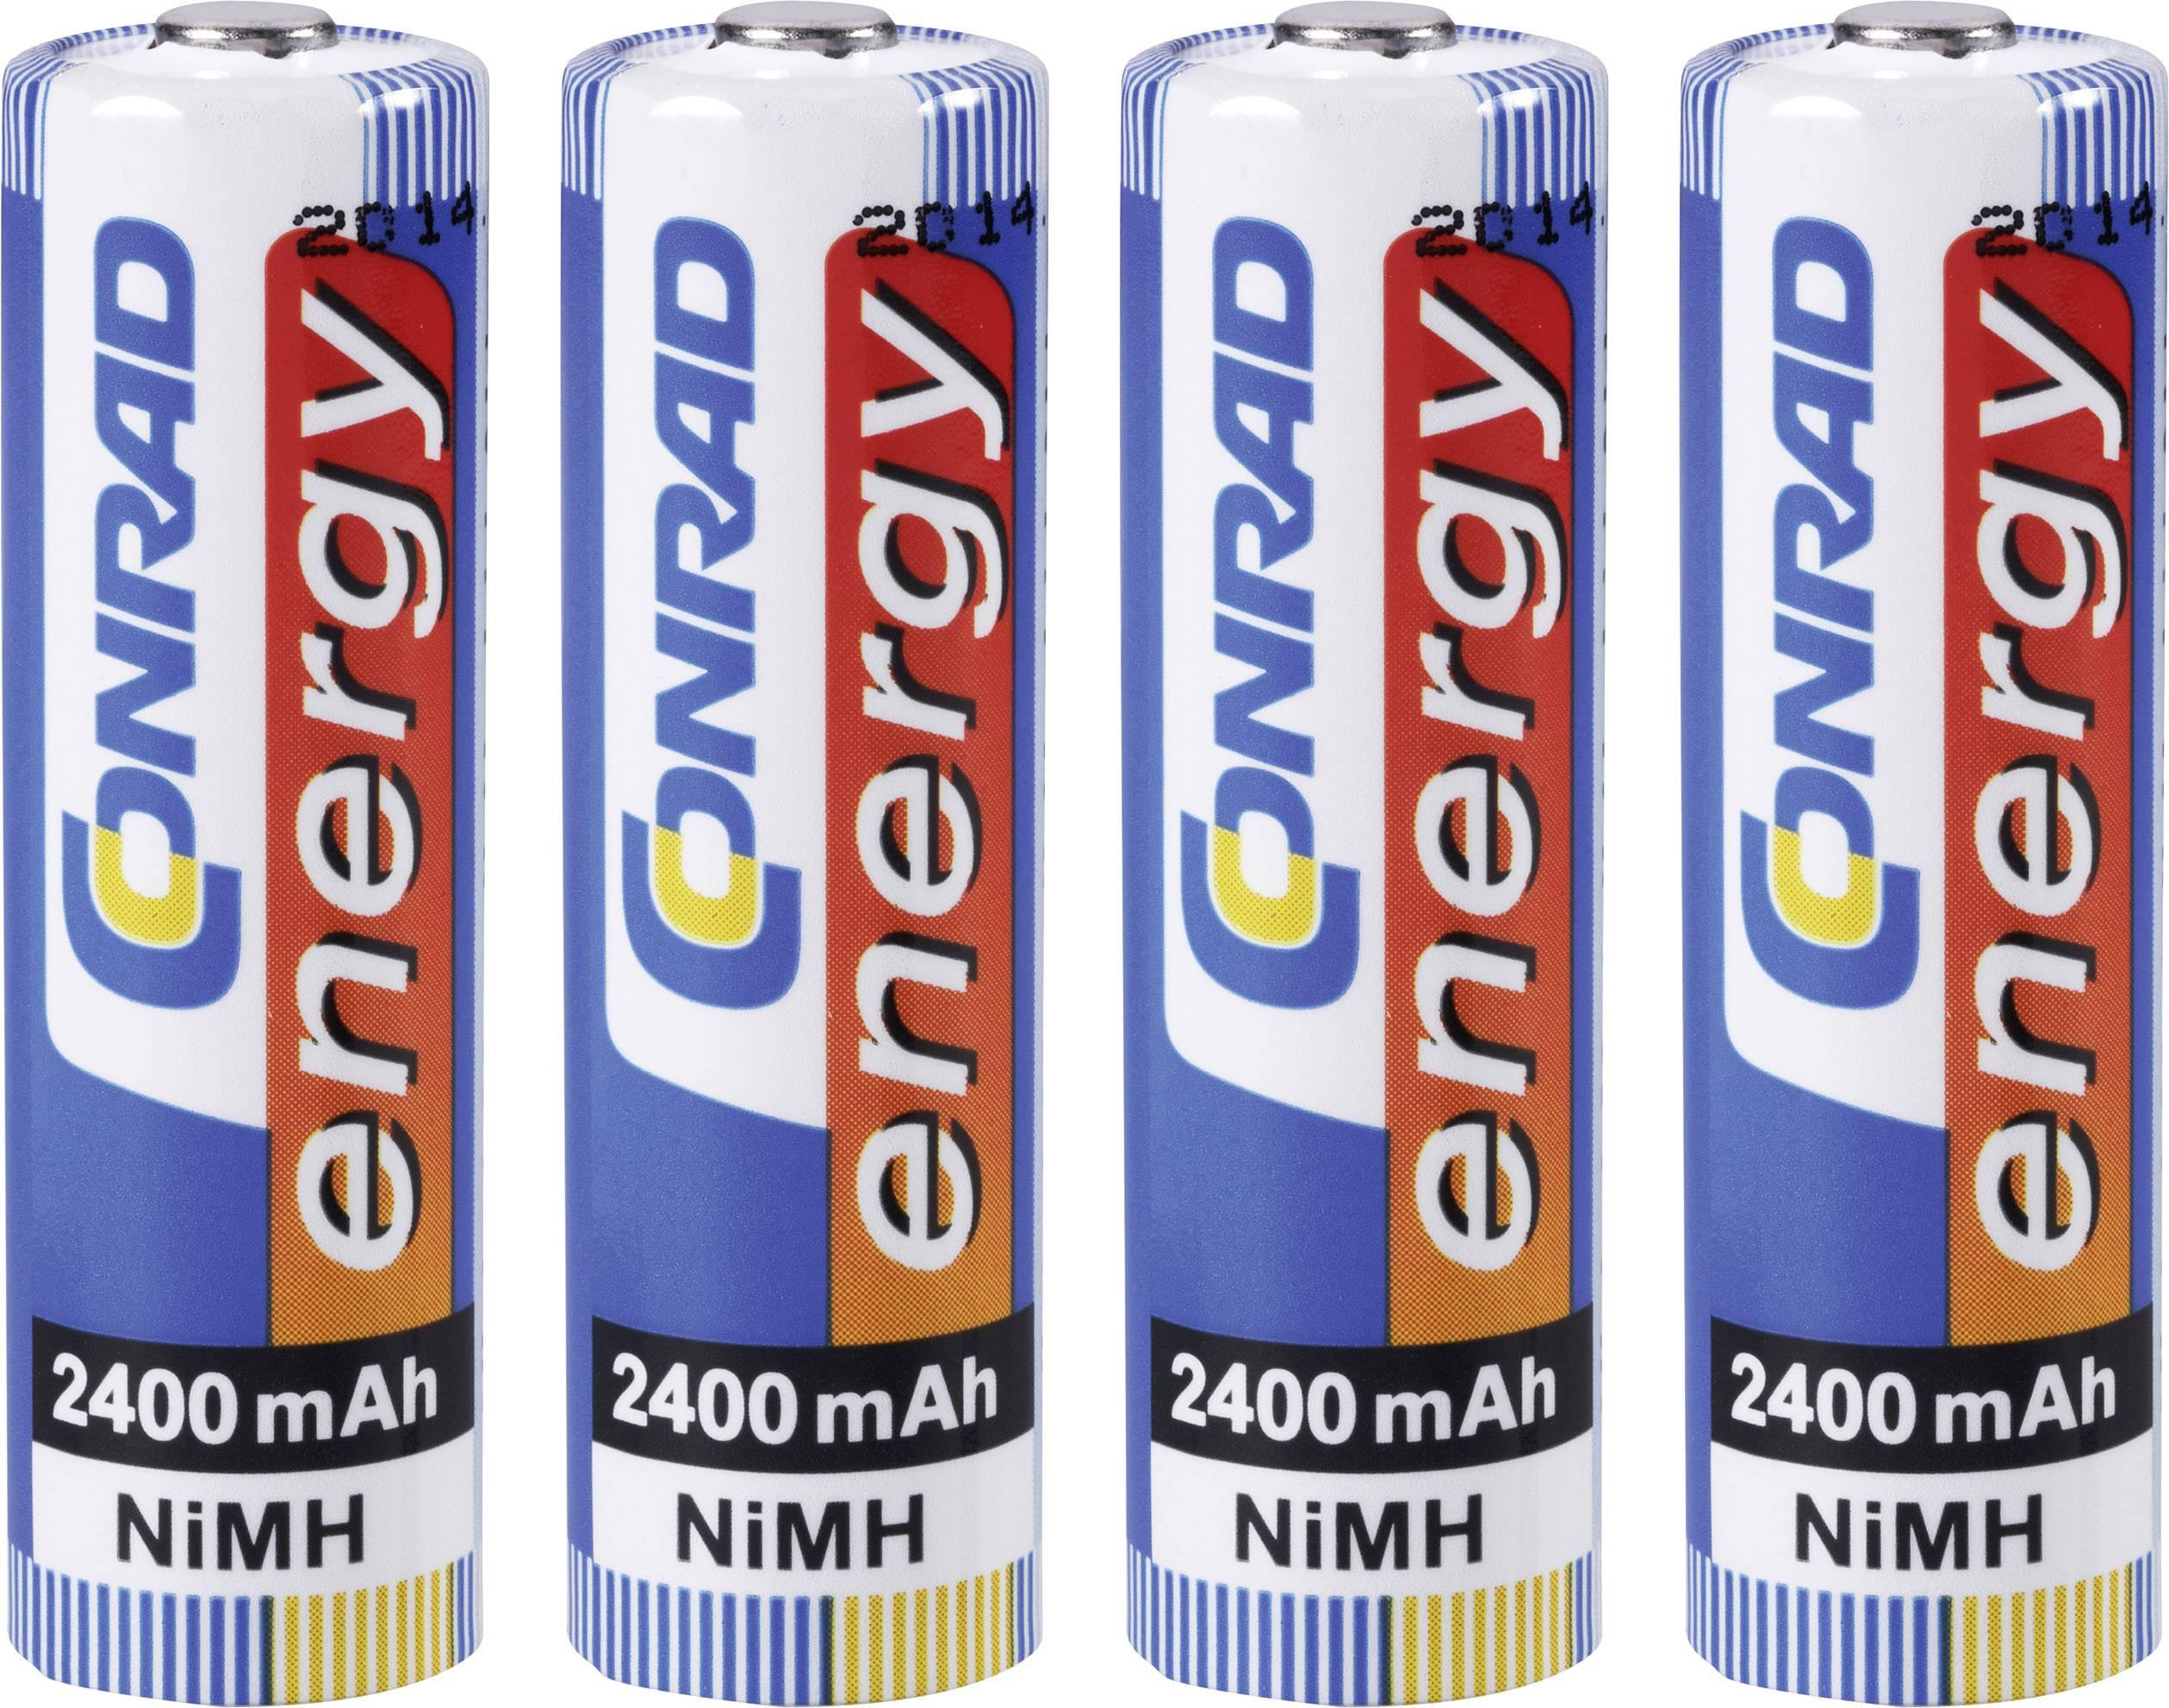 NiMH mignon akumulátory 2400mAh Conrad Energy, 4 kusy